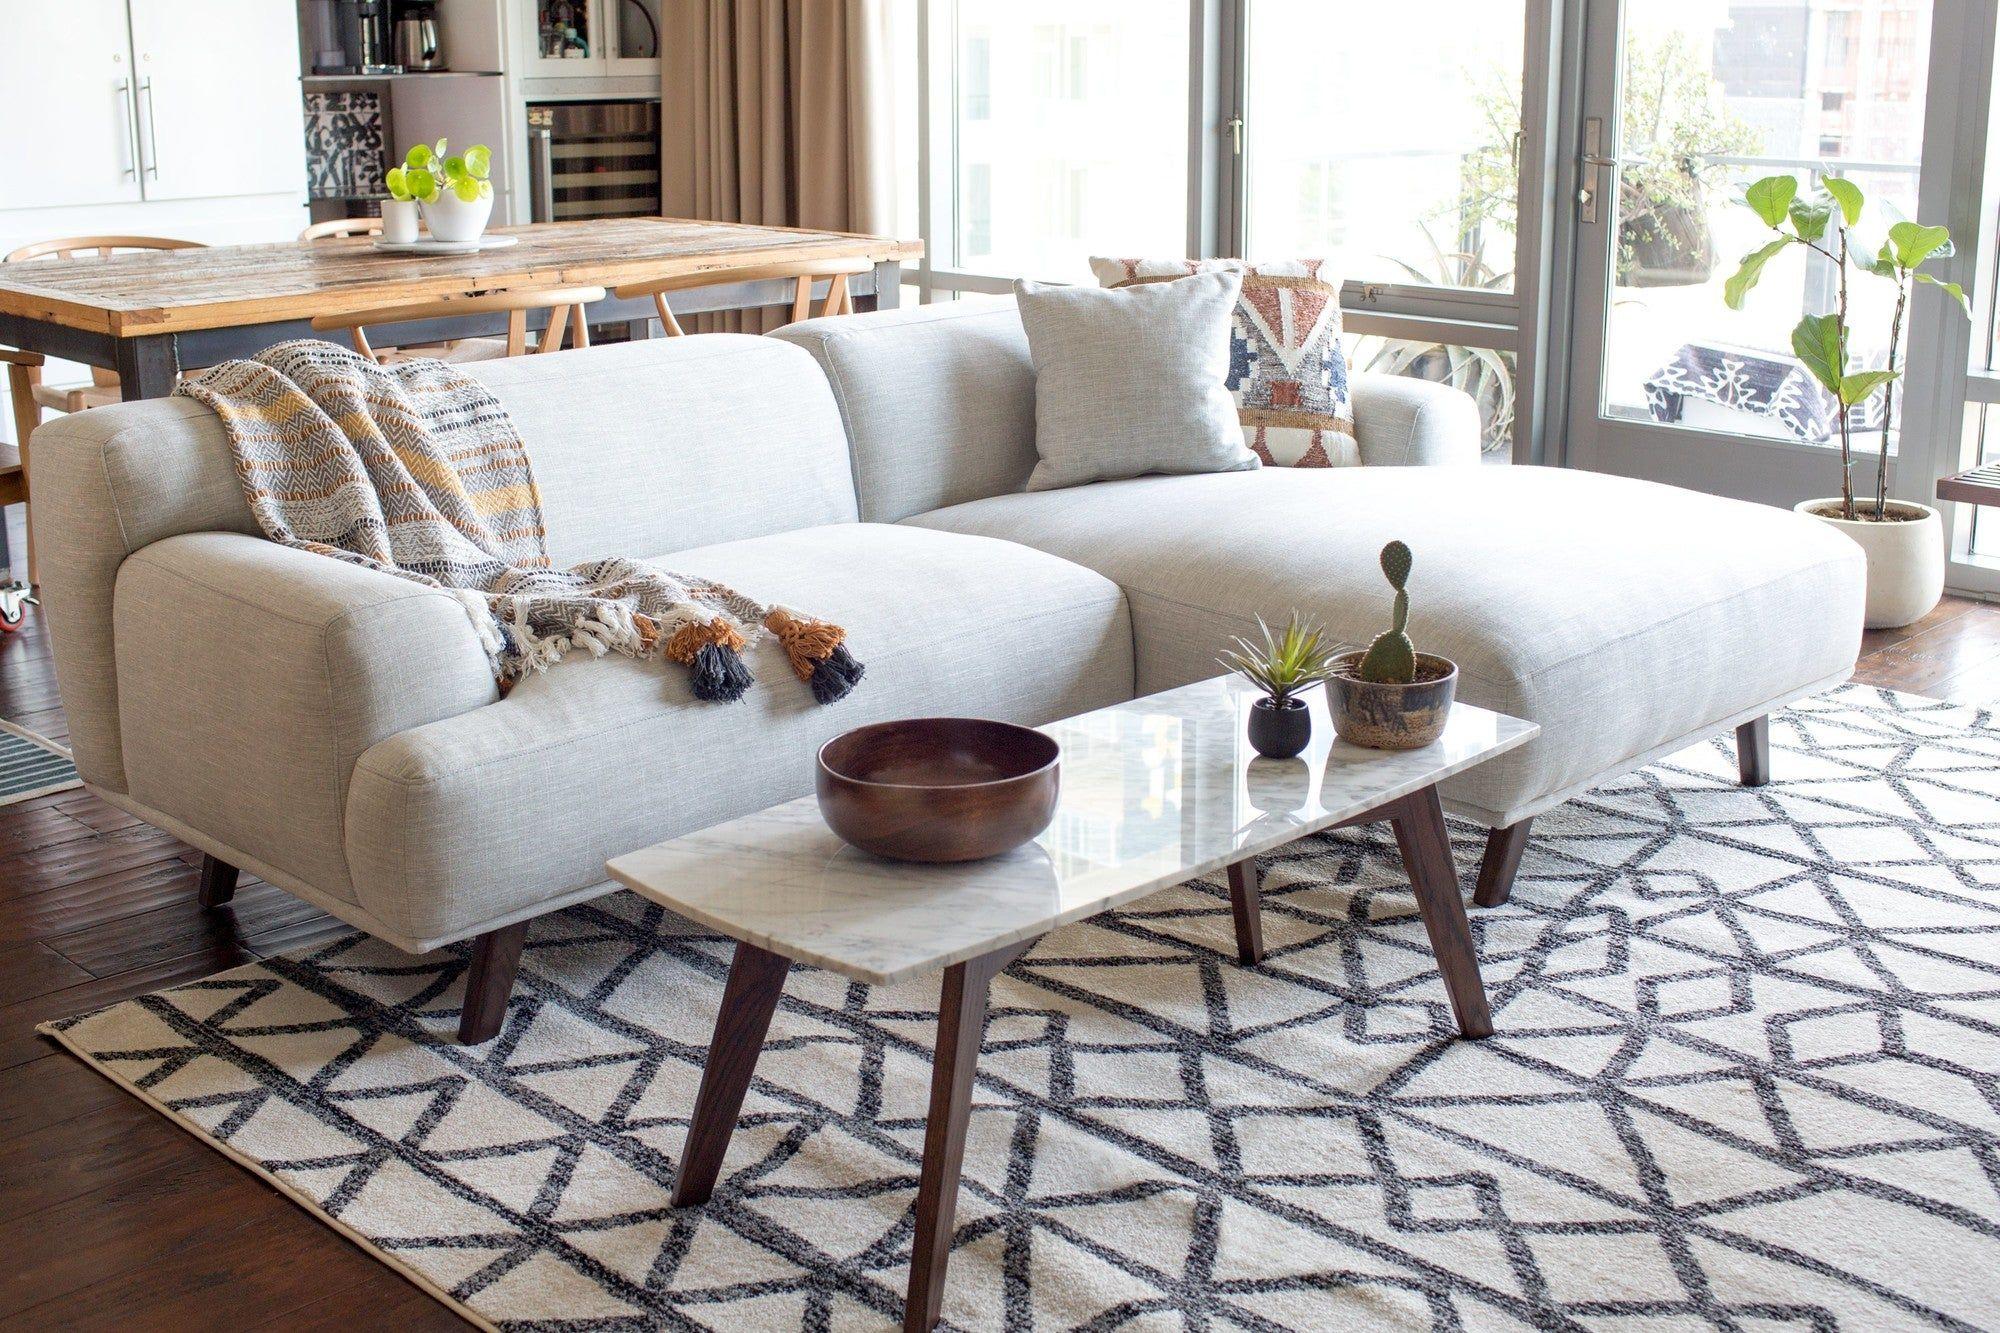 Mineta Right Facing Sectional Sofa In 2020 Modern Sofa Sectional Rugs In Living Room Sectional Sofa